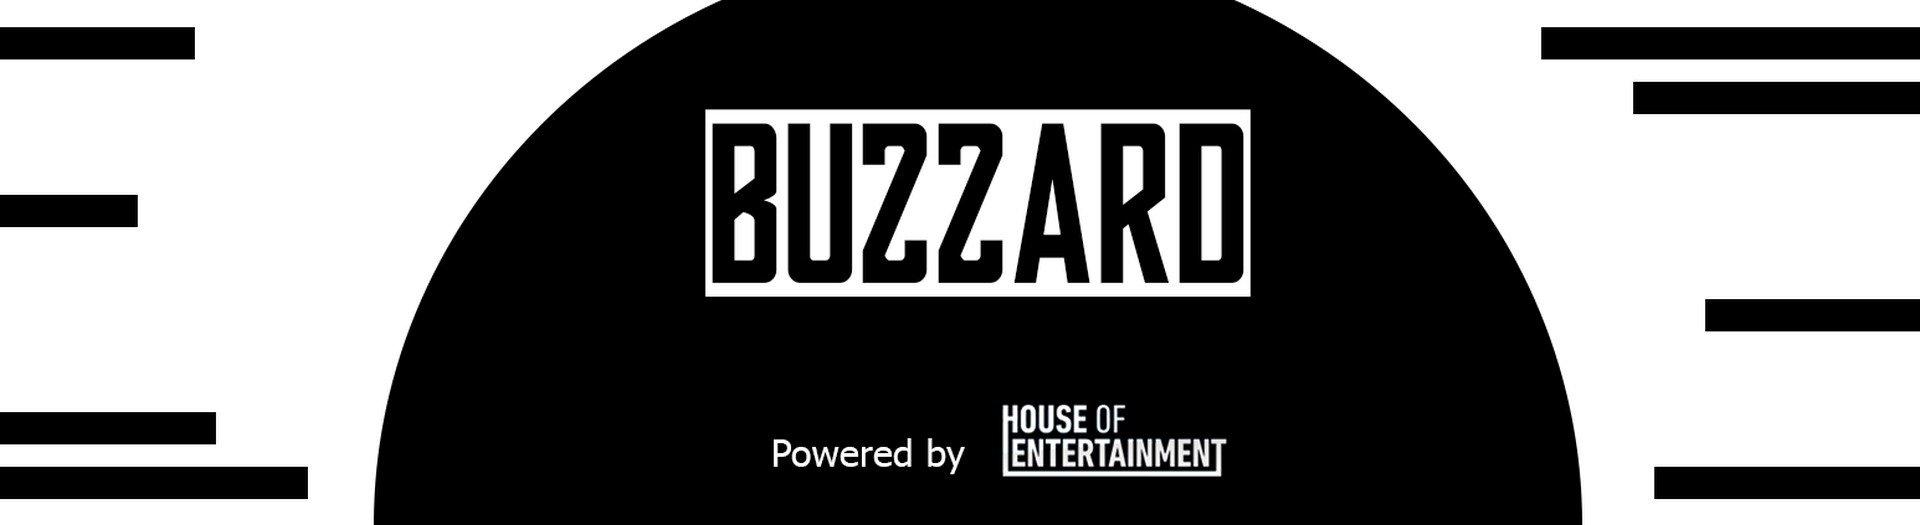 Nina Butera met nieuwe single 'Draai de liefde terug' - Logo Buzzard 2